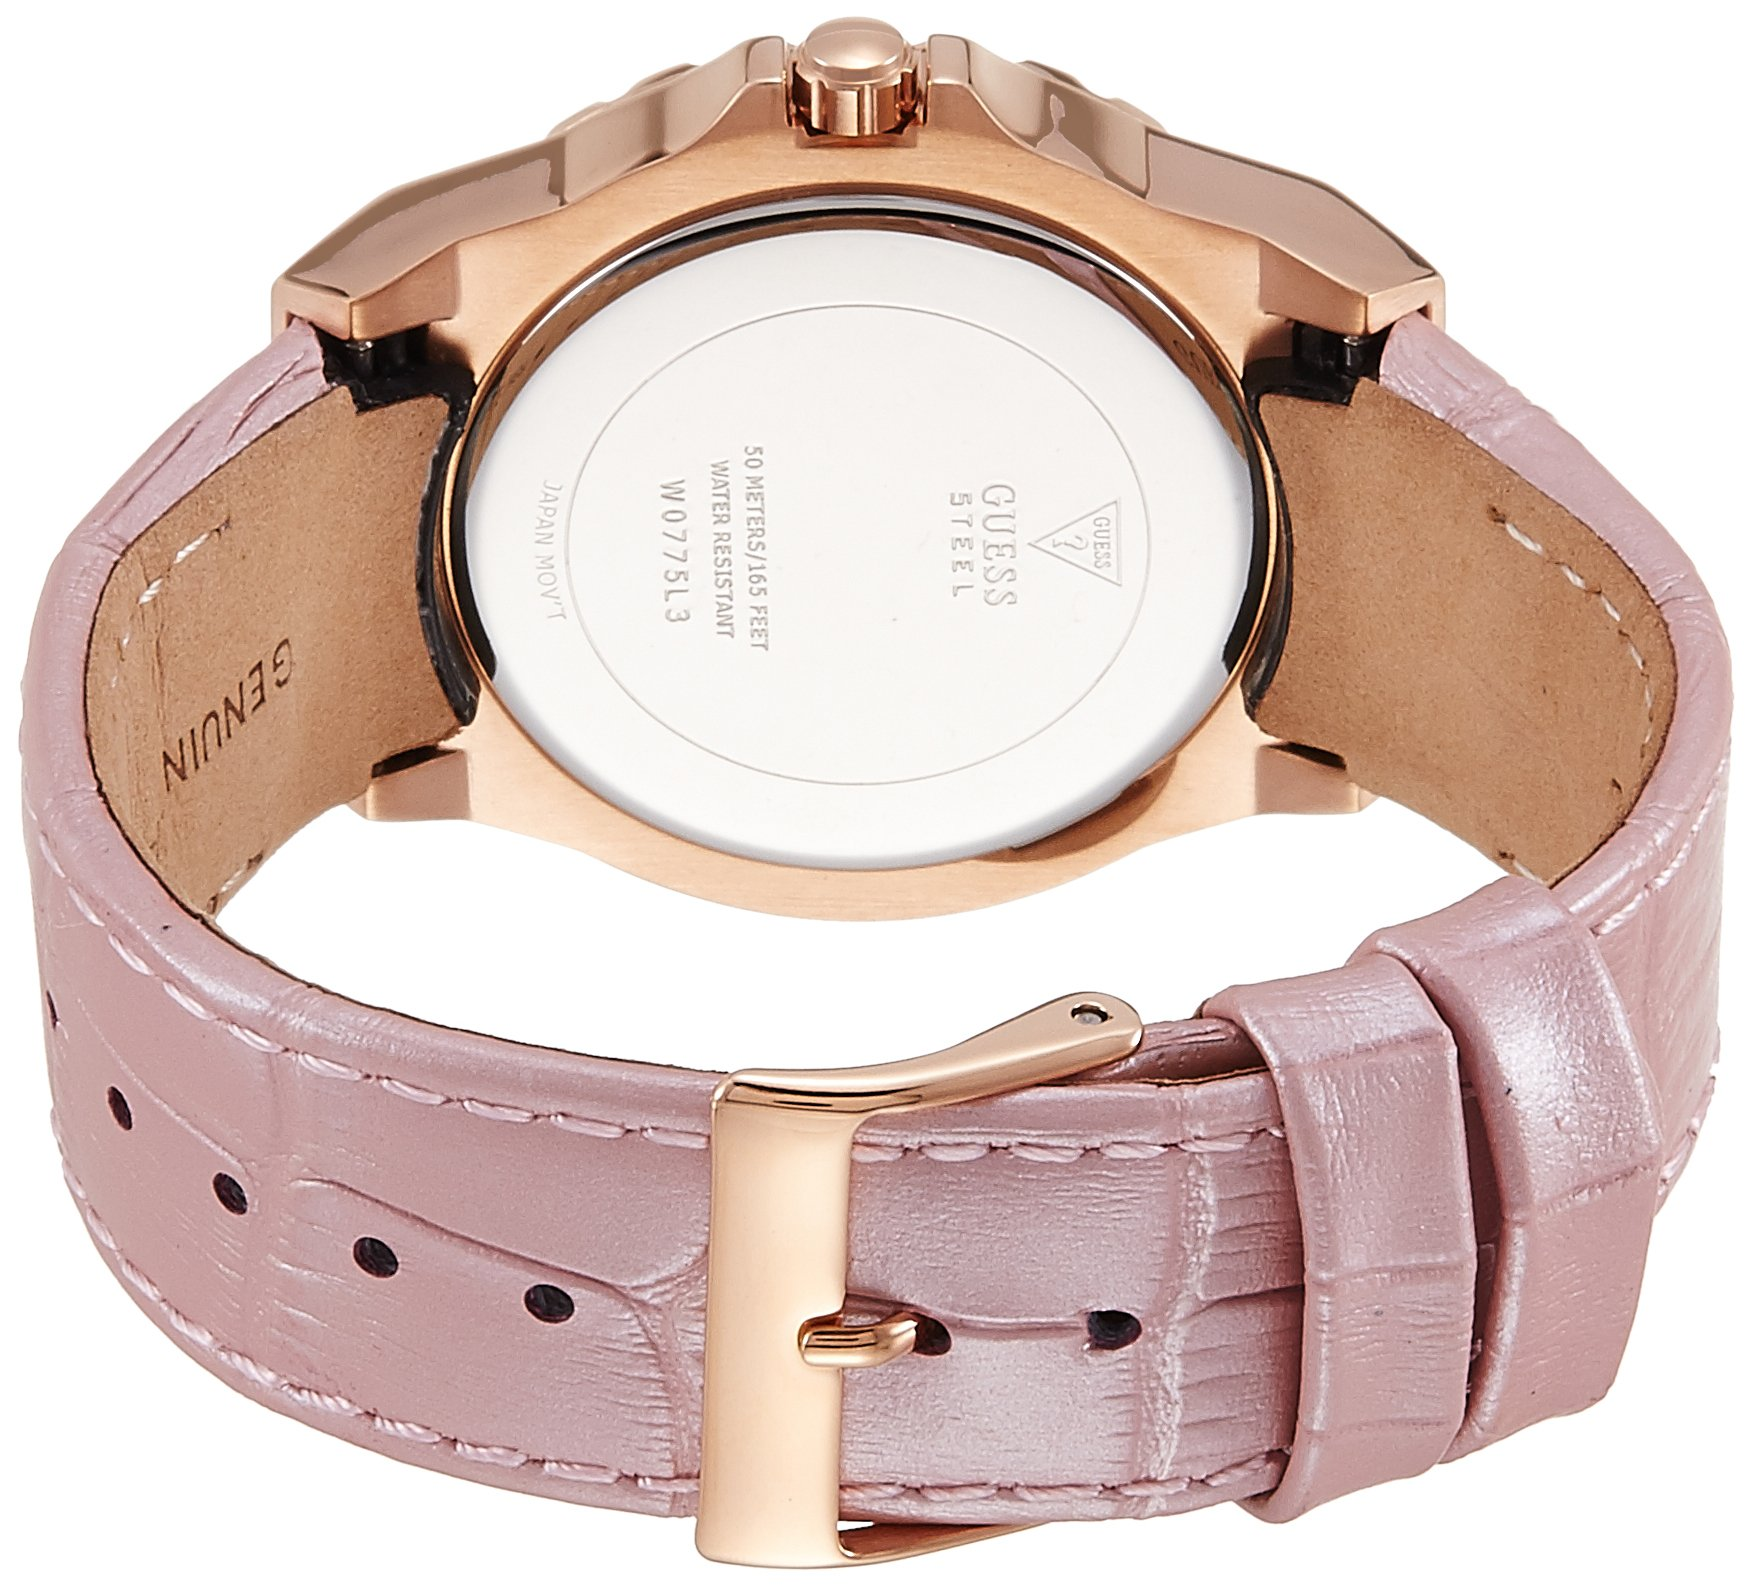 e12c3eb38529 Inicio   Marcas   Guess   Guess Reloj analogico para Mujer de Cuarzo con  Correa en Tela W0775L3